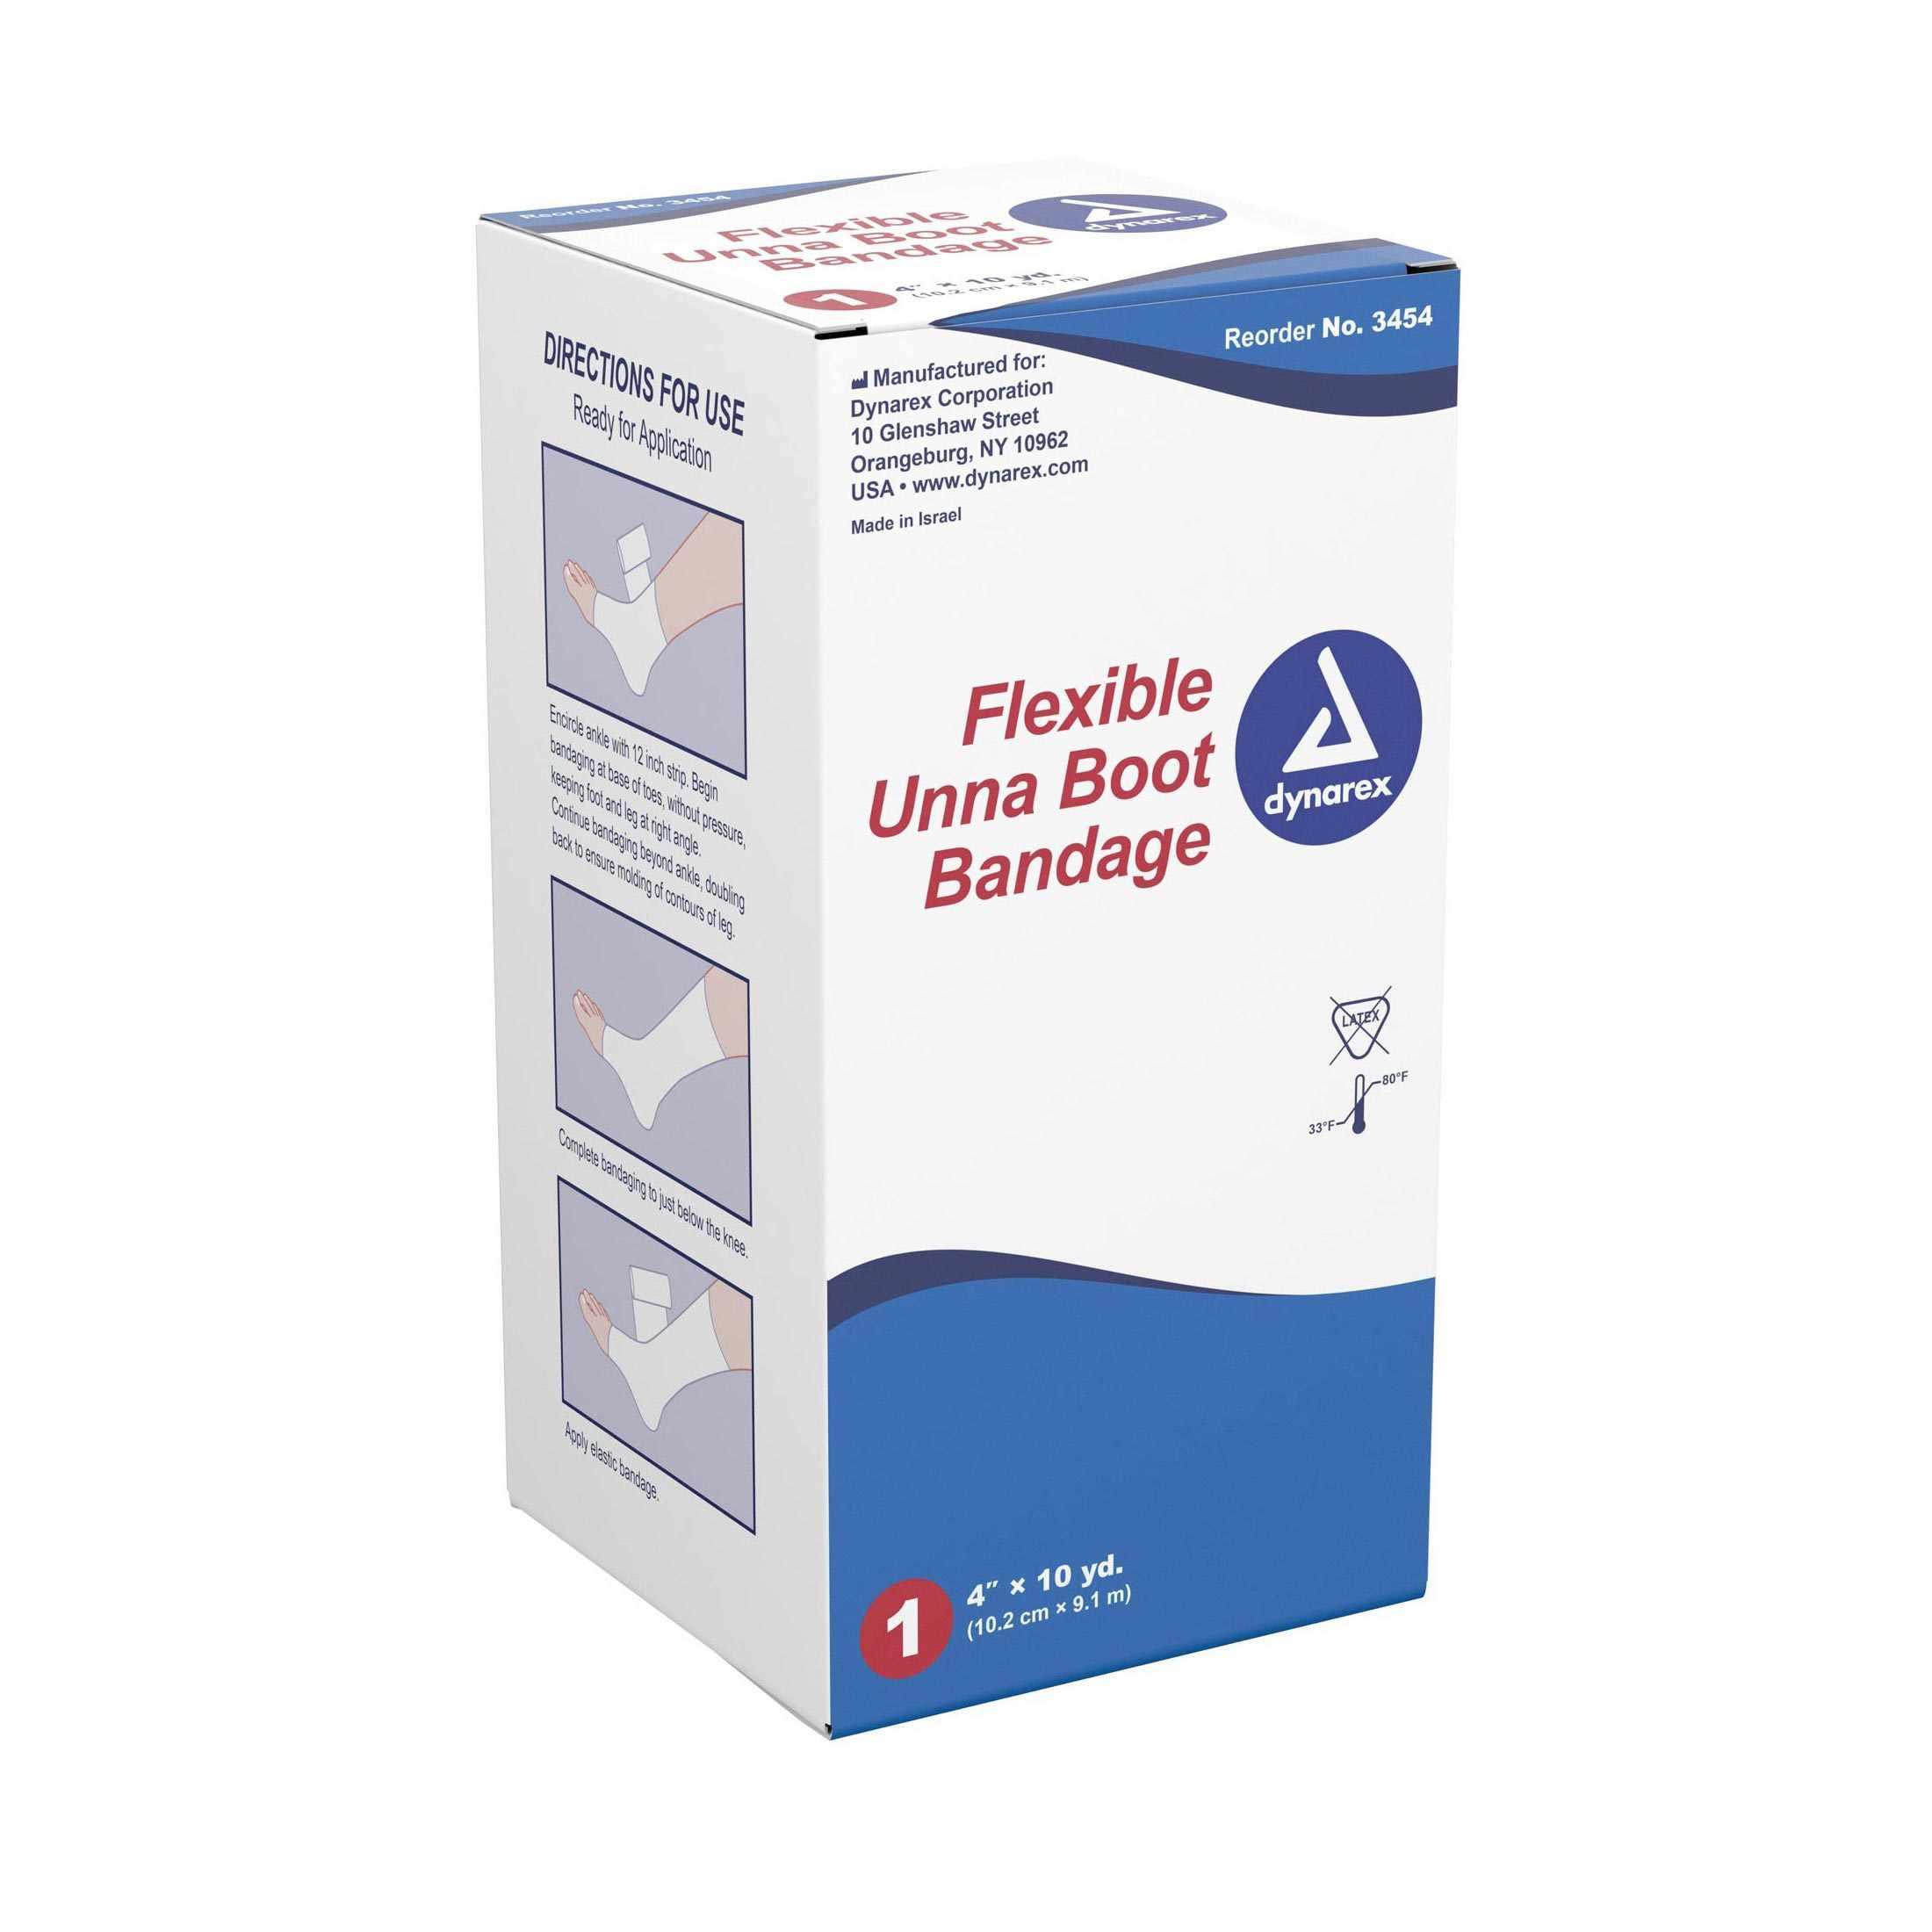 Unna Boot Bandage 4 Inch x 10 yard Zinc Oxide Paste NonSterile